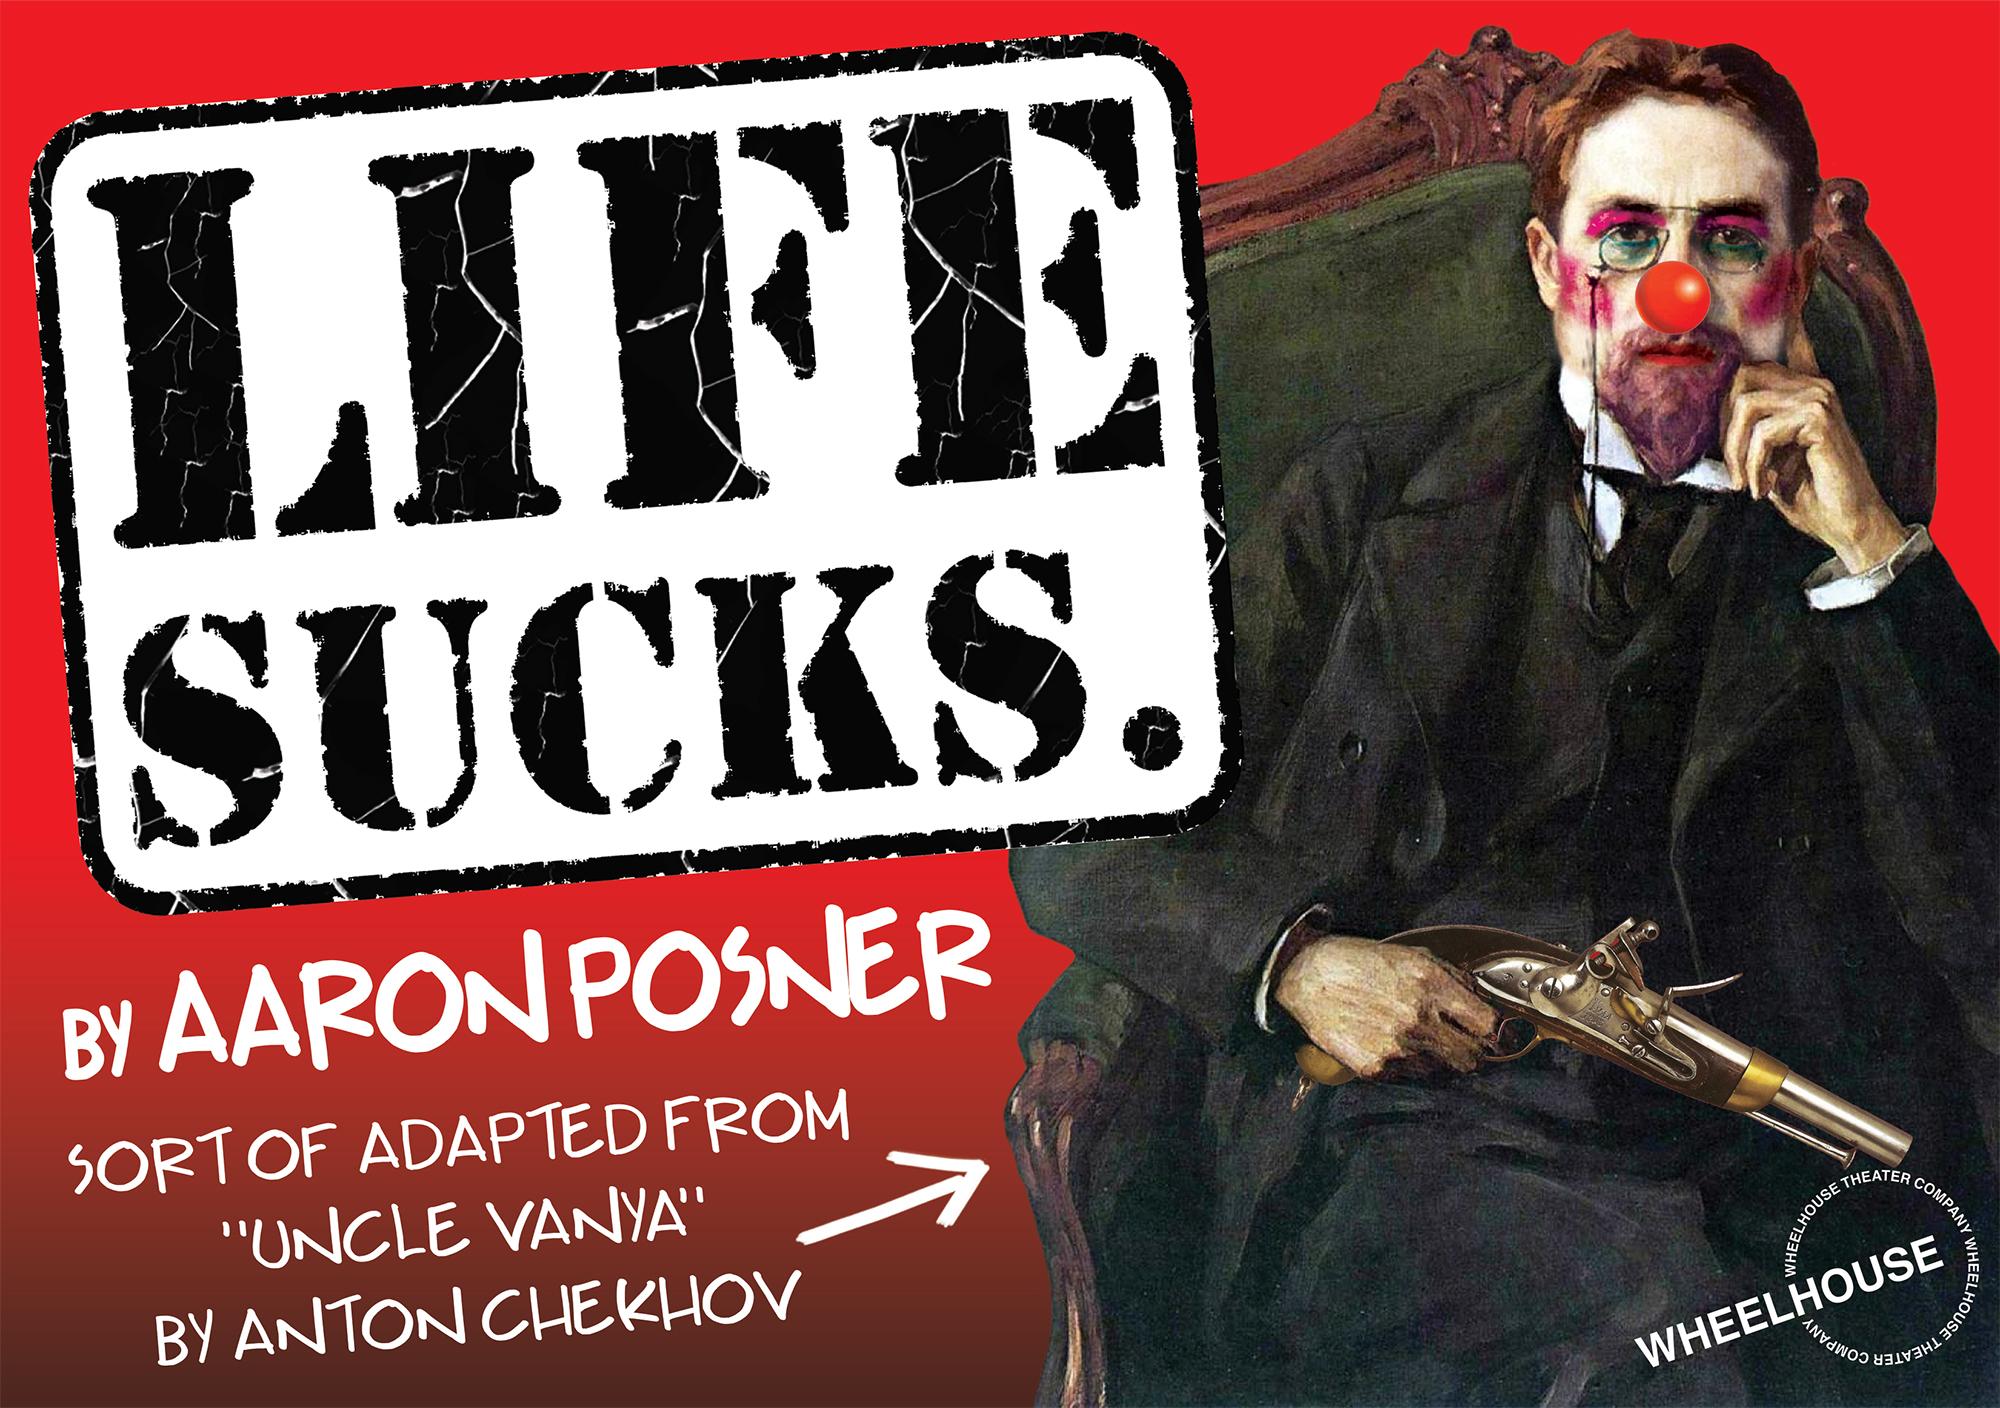 Life Sucks Off-Broadway